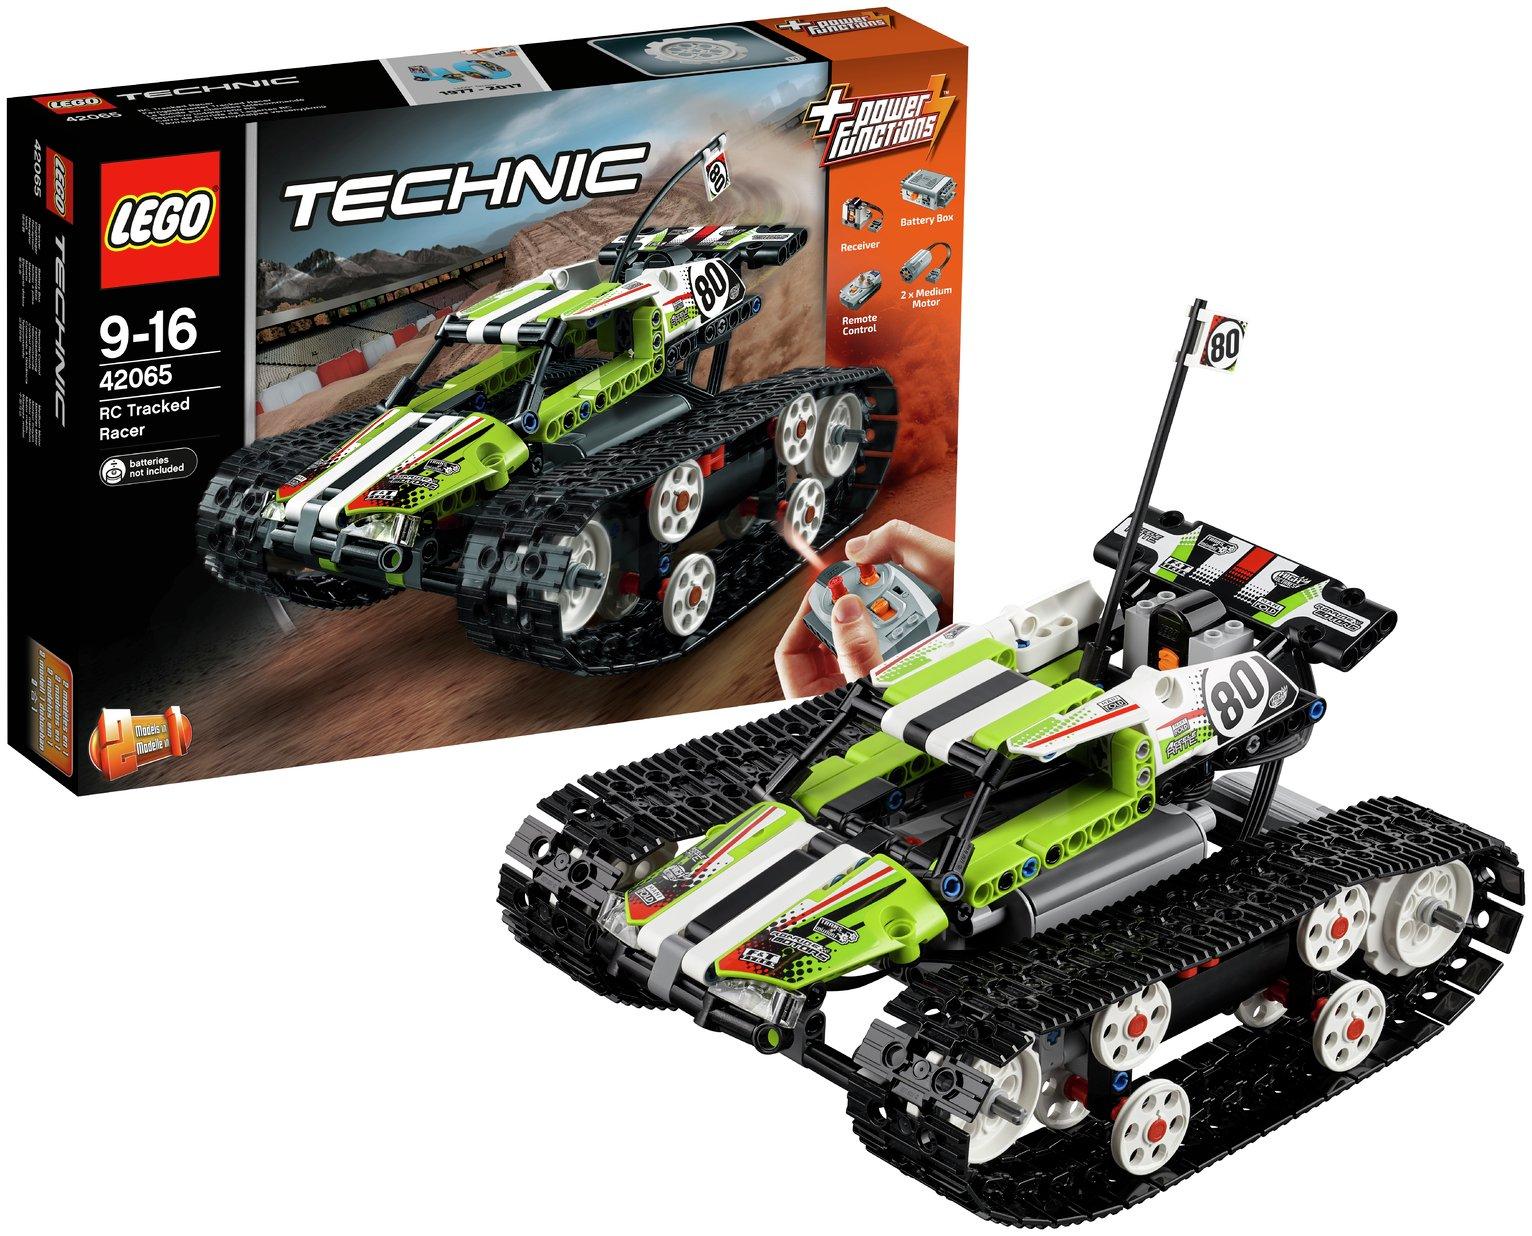 Image of LEGO Technic RC Racer - 42065.